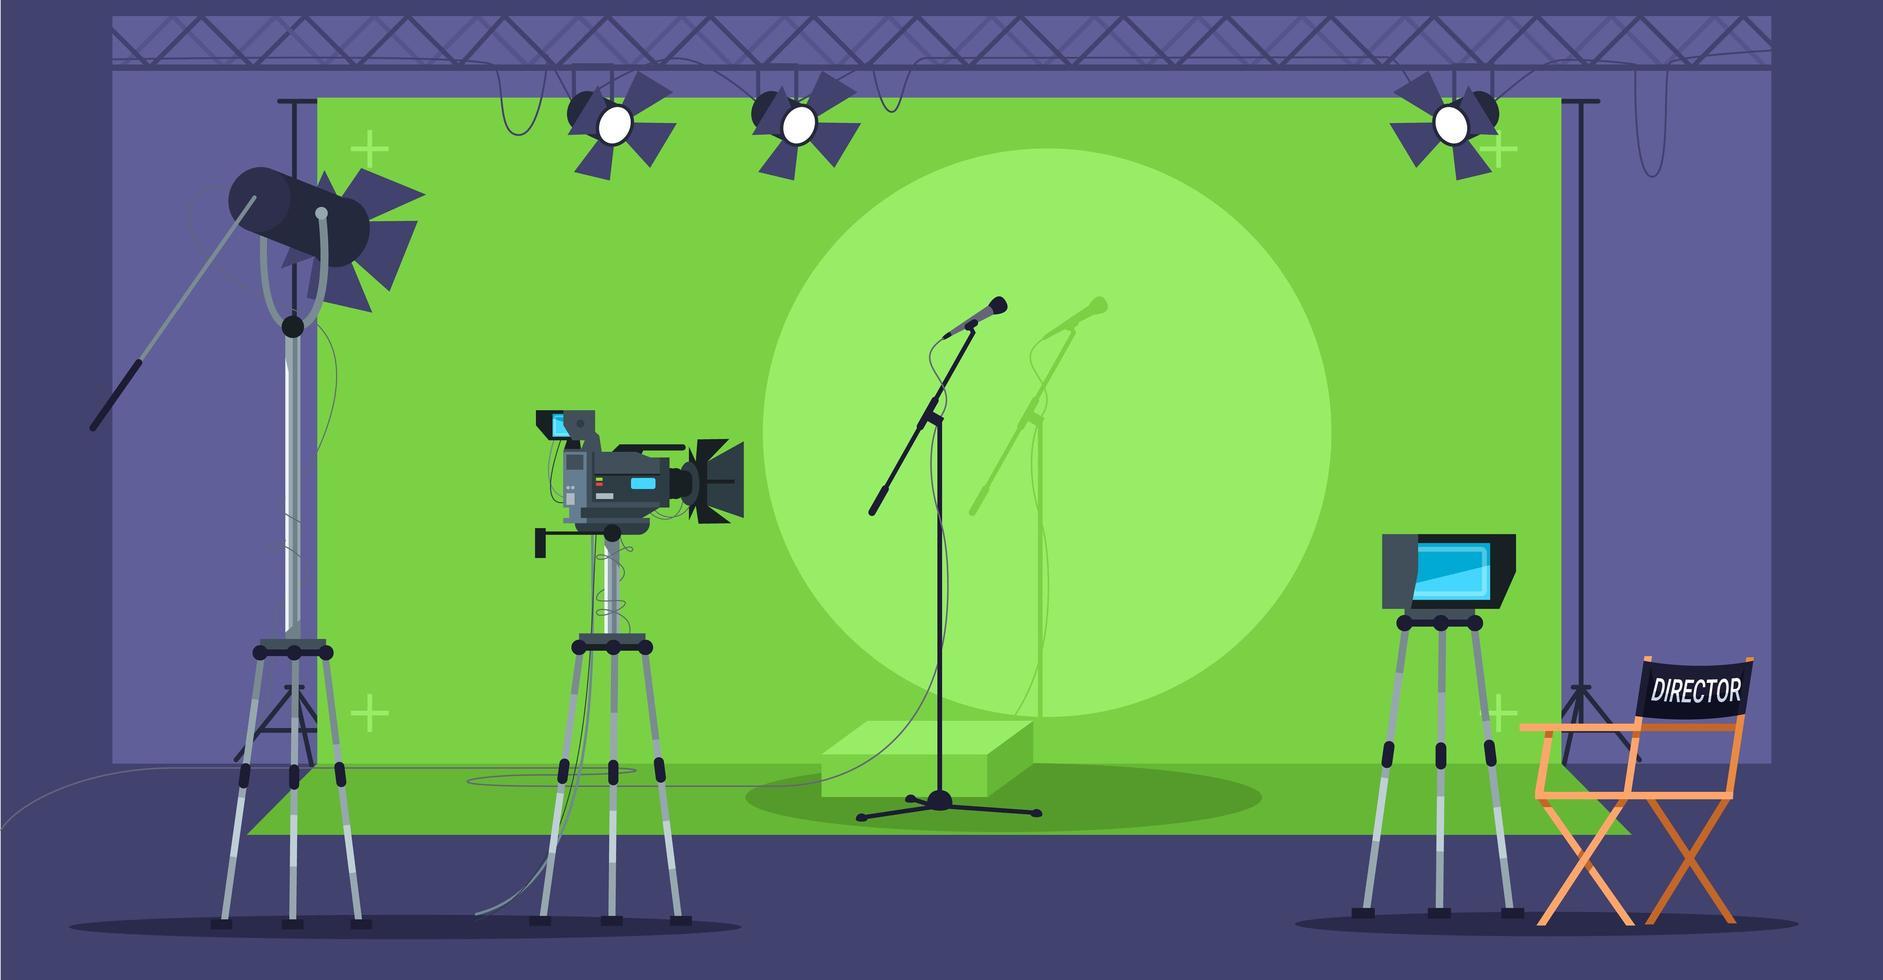 muzikale show filmen semi platte vectorillustratie vector